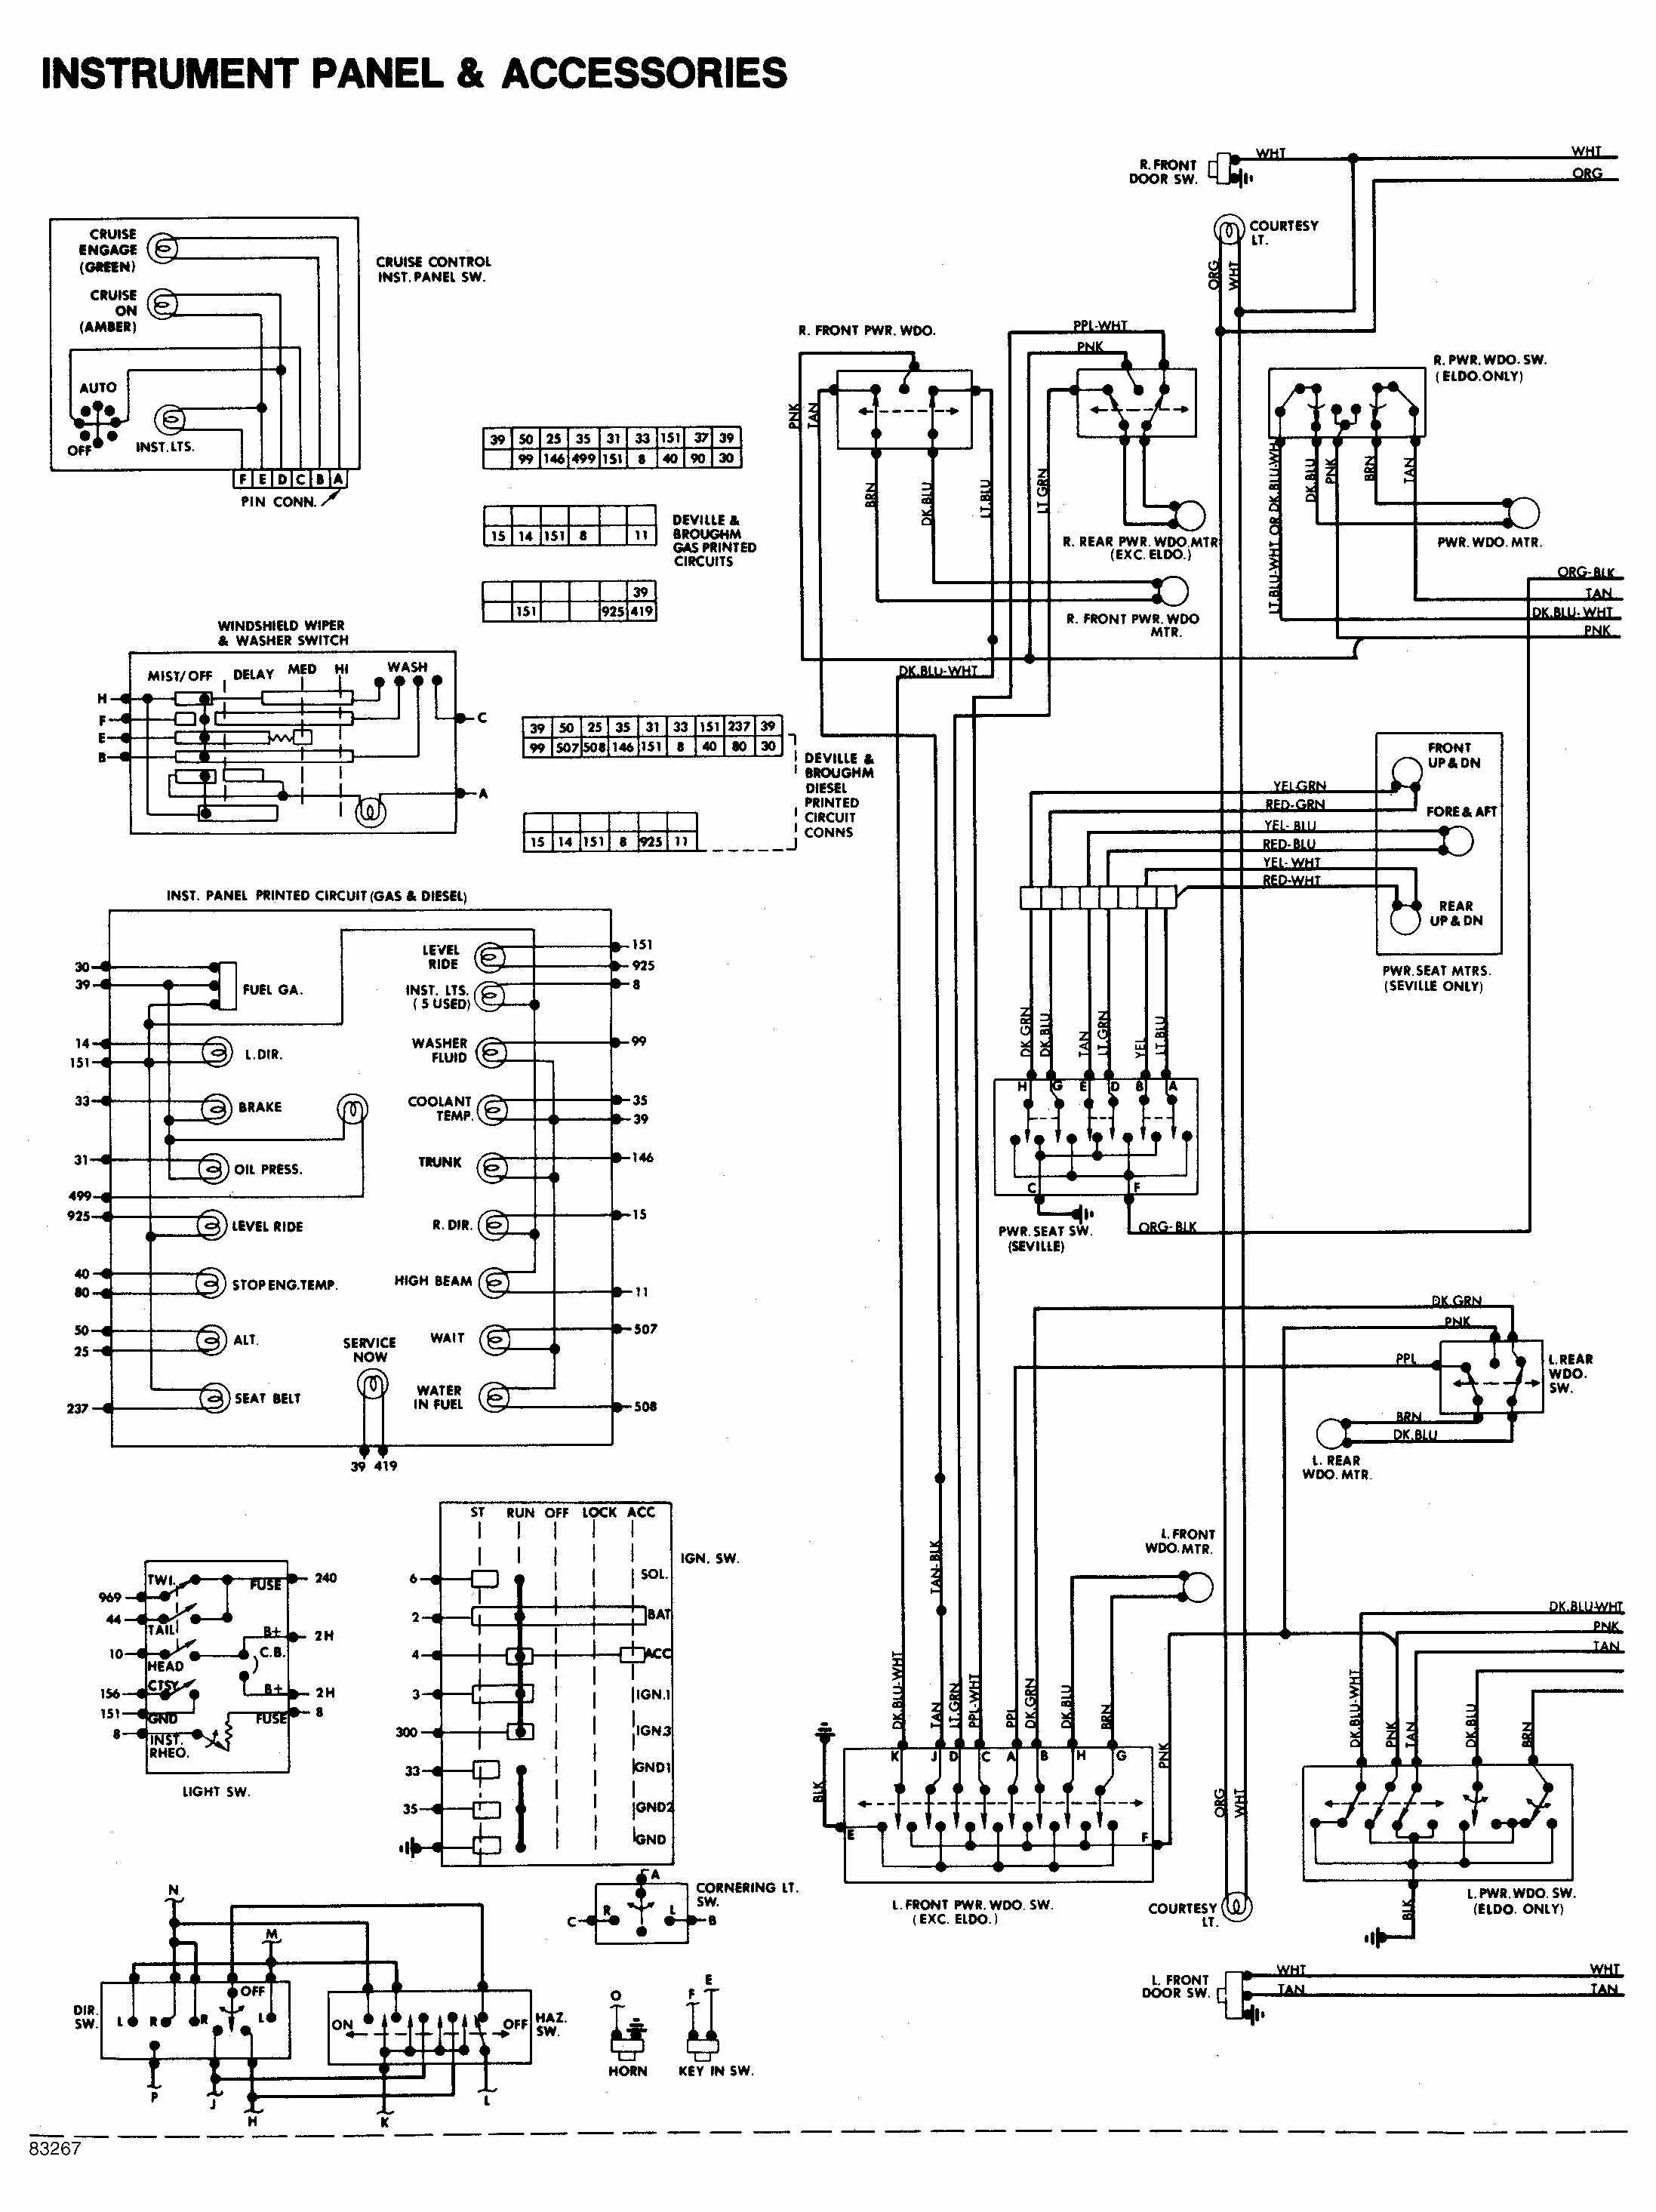 97 Deville Wiring Diagram - Data Wiring Diagram on home wiring diagram, 2002 deville engine, 2002 deville serpentine belt diagram, 97 deville wiring diagram, 2004 deville wiring diagram, 2000 deville wiring diagram, 2002 deville firing order, 2003 deville wiring diagram, cadillac wiring diagram, 2002 deville tires, 2002 deville neutral safety switch, air shocks wiring diagram,